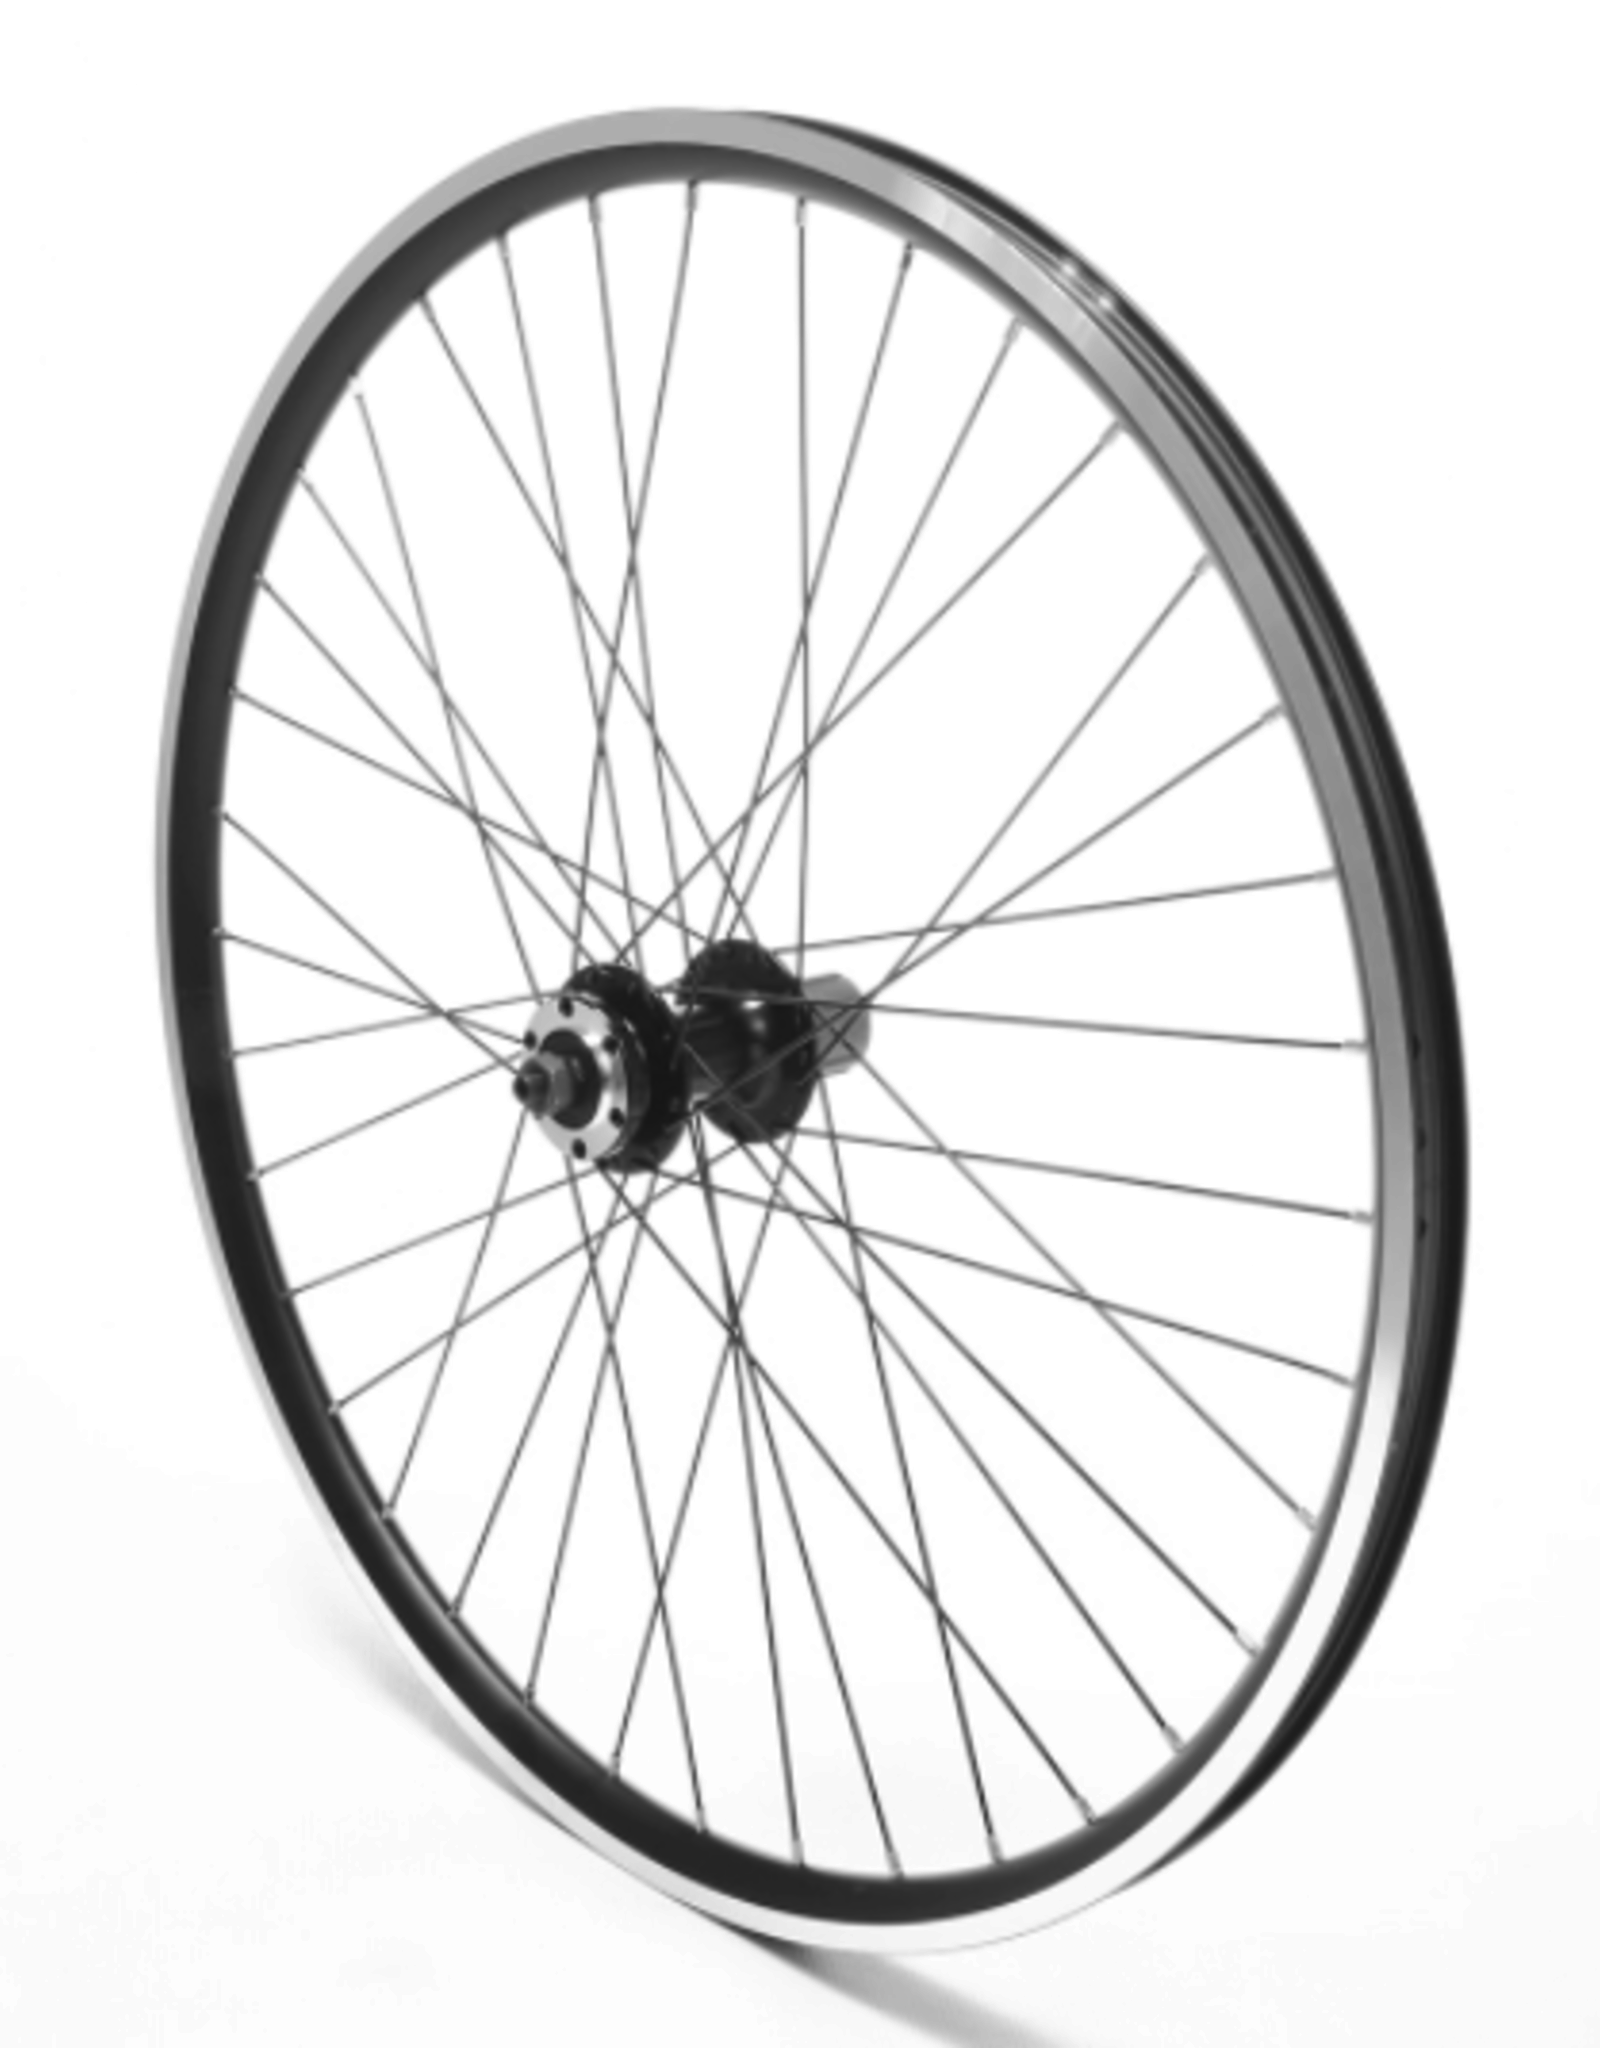 "26"" Rear Wheel - Q/R Disc - Cass - Black V-Sec ATB"